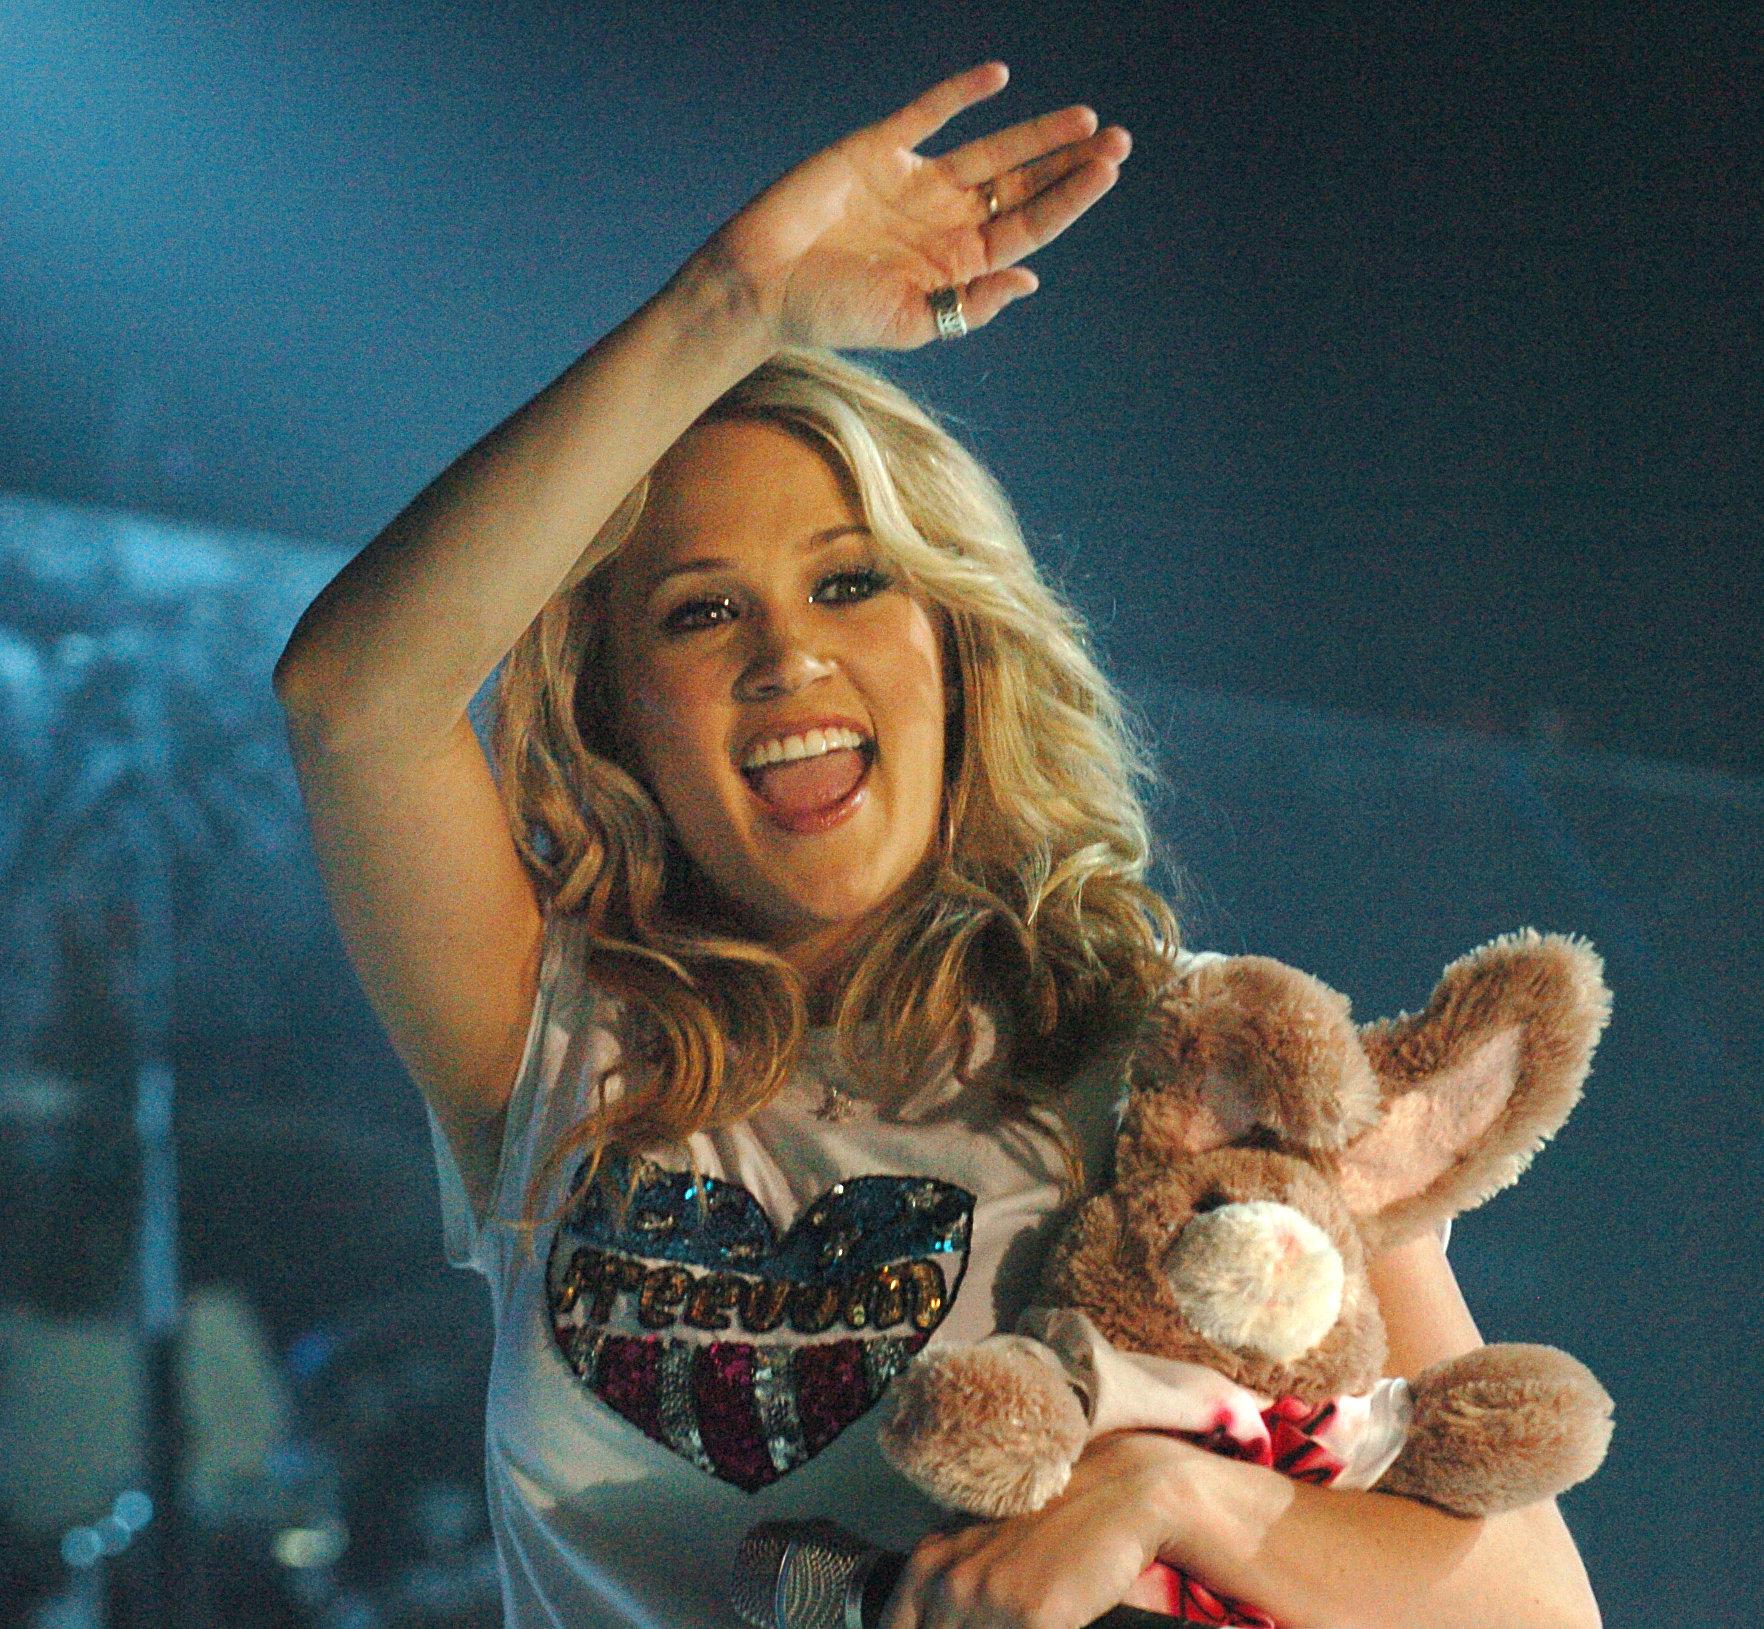 Carrie Underwood injured